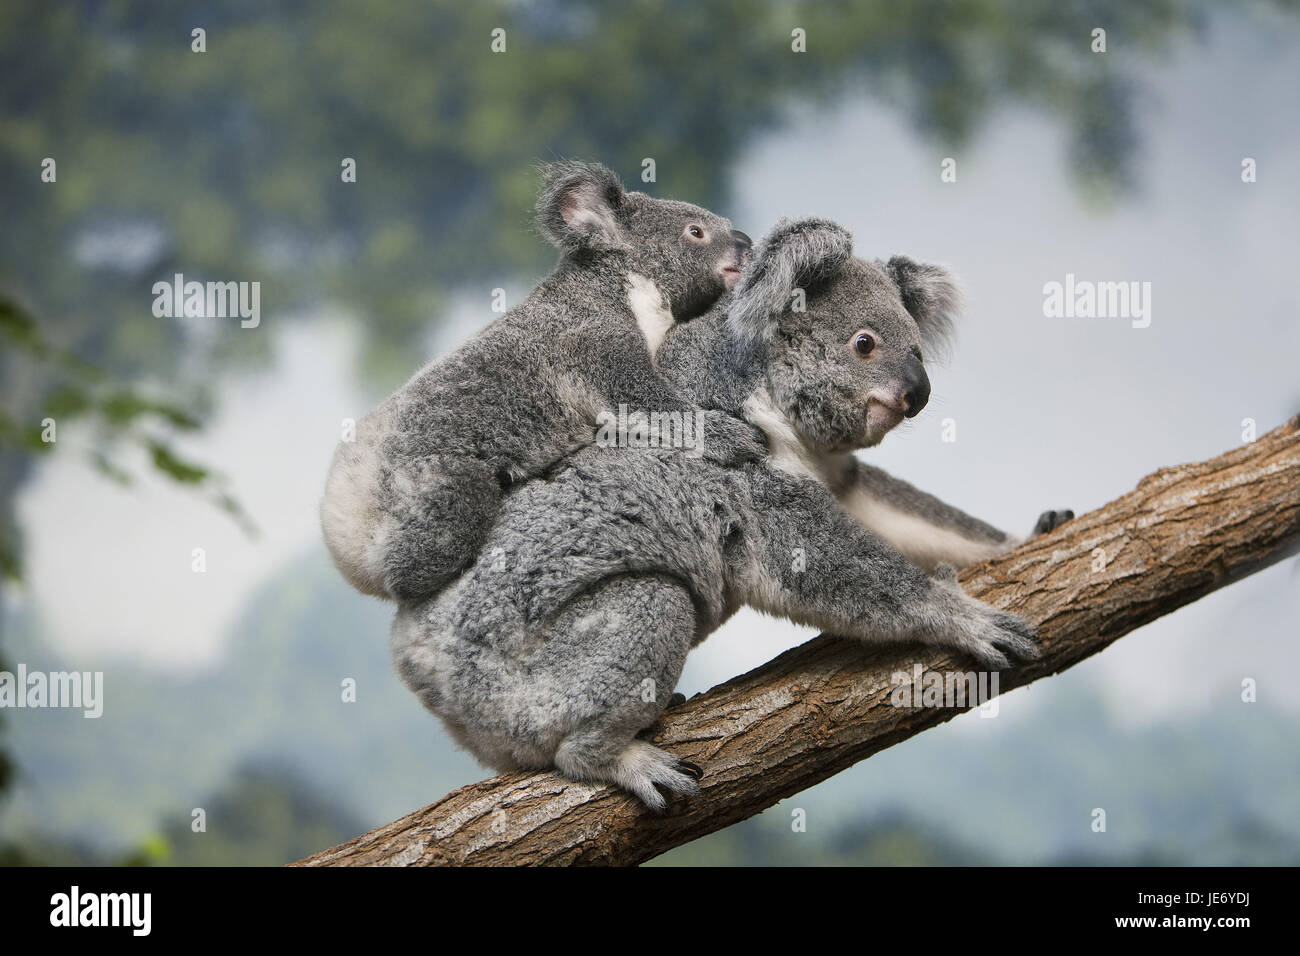 Il Koala, Phascolarctos cinereus, anche ash-GREY KOALA, femmina, trasportare, giovane animale, indietro Immagini Stock